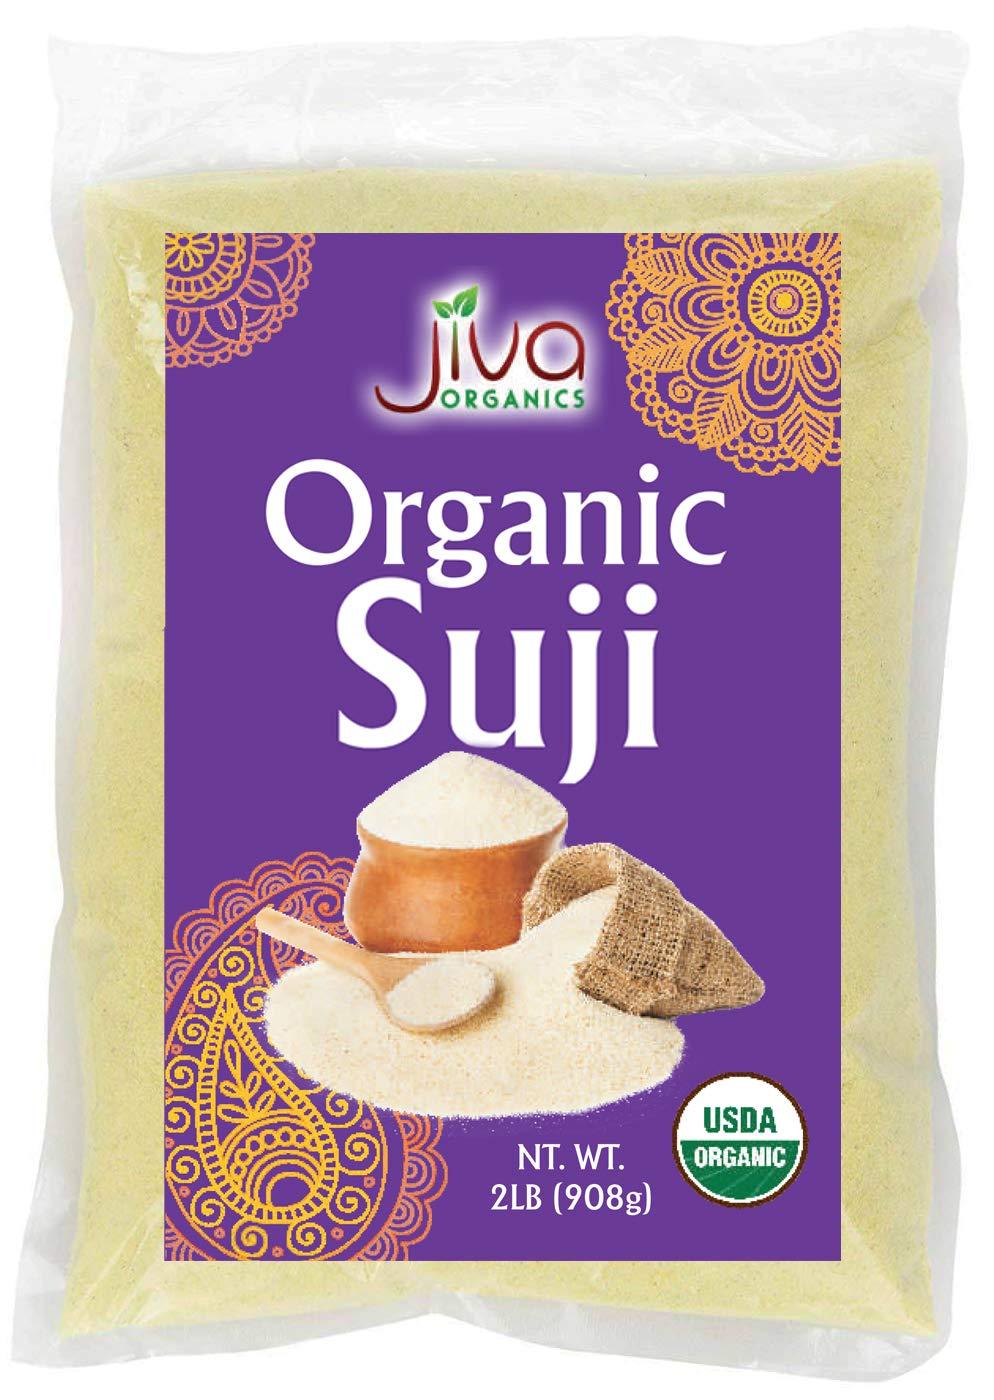 Jiva Organics Organic Suji (Farina) - 2 Pound (32oz) - Wheat, Ra